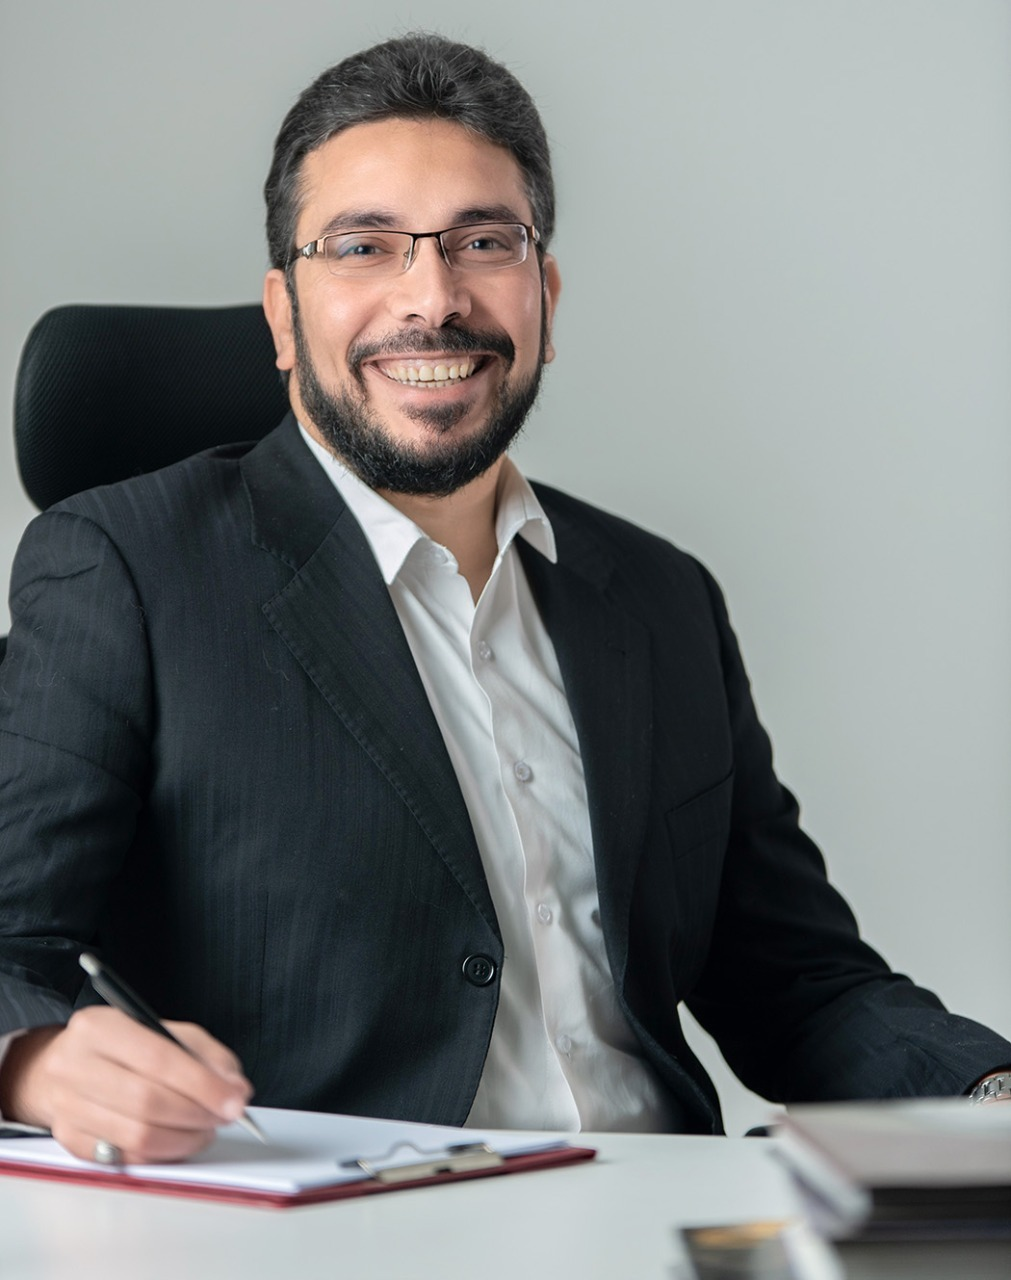 Ahmed Abdelsalam